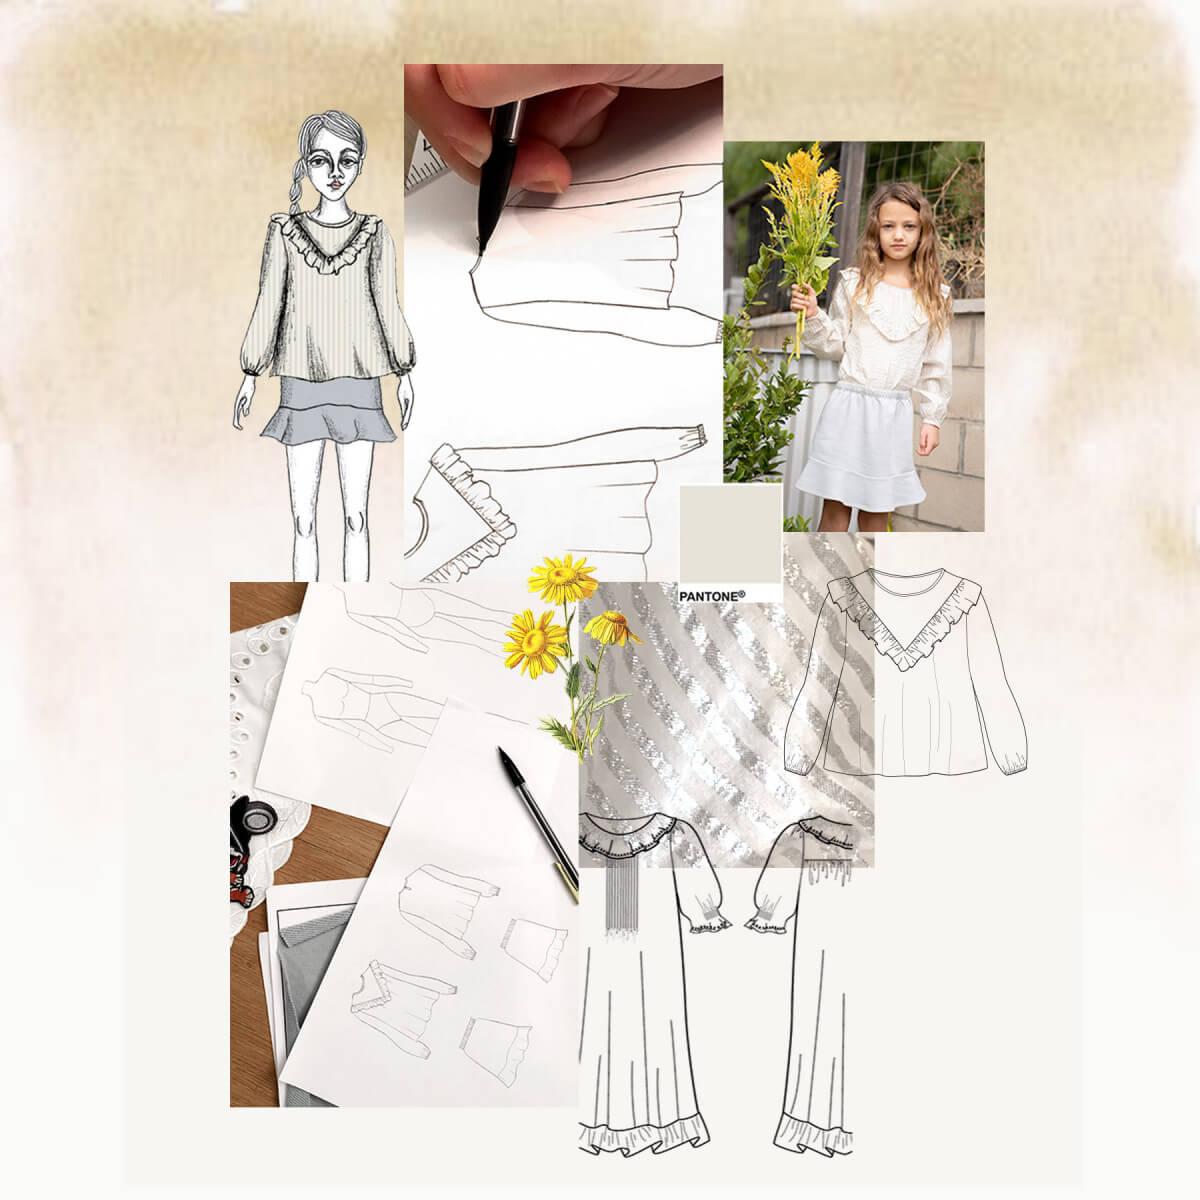 Studio Wild & Gorgeous - Fashion Design Class #3 - Technical Illustrations Part 1